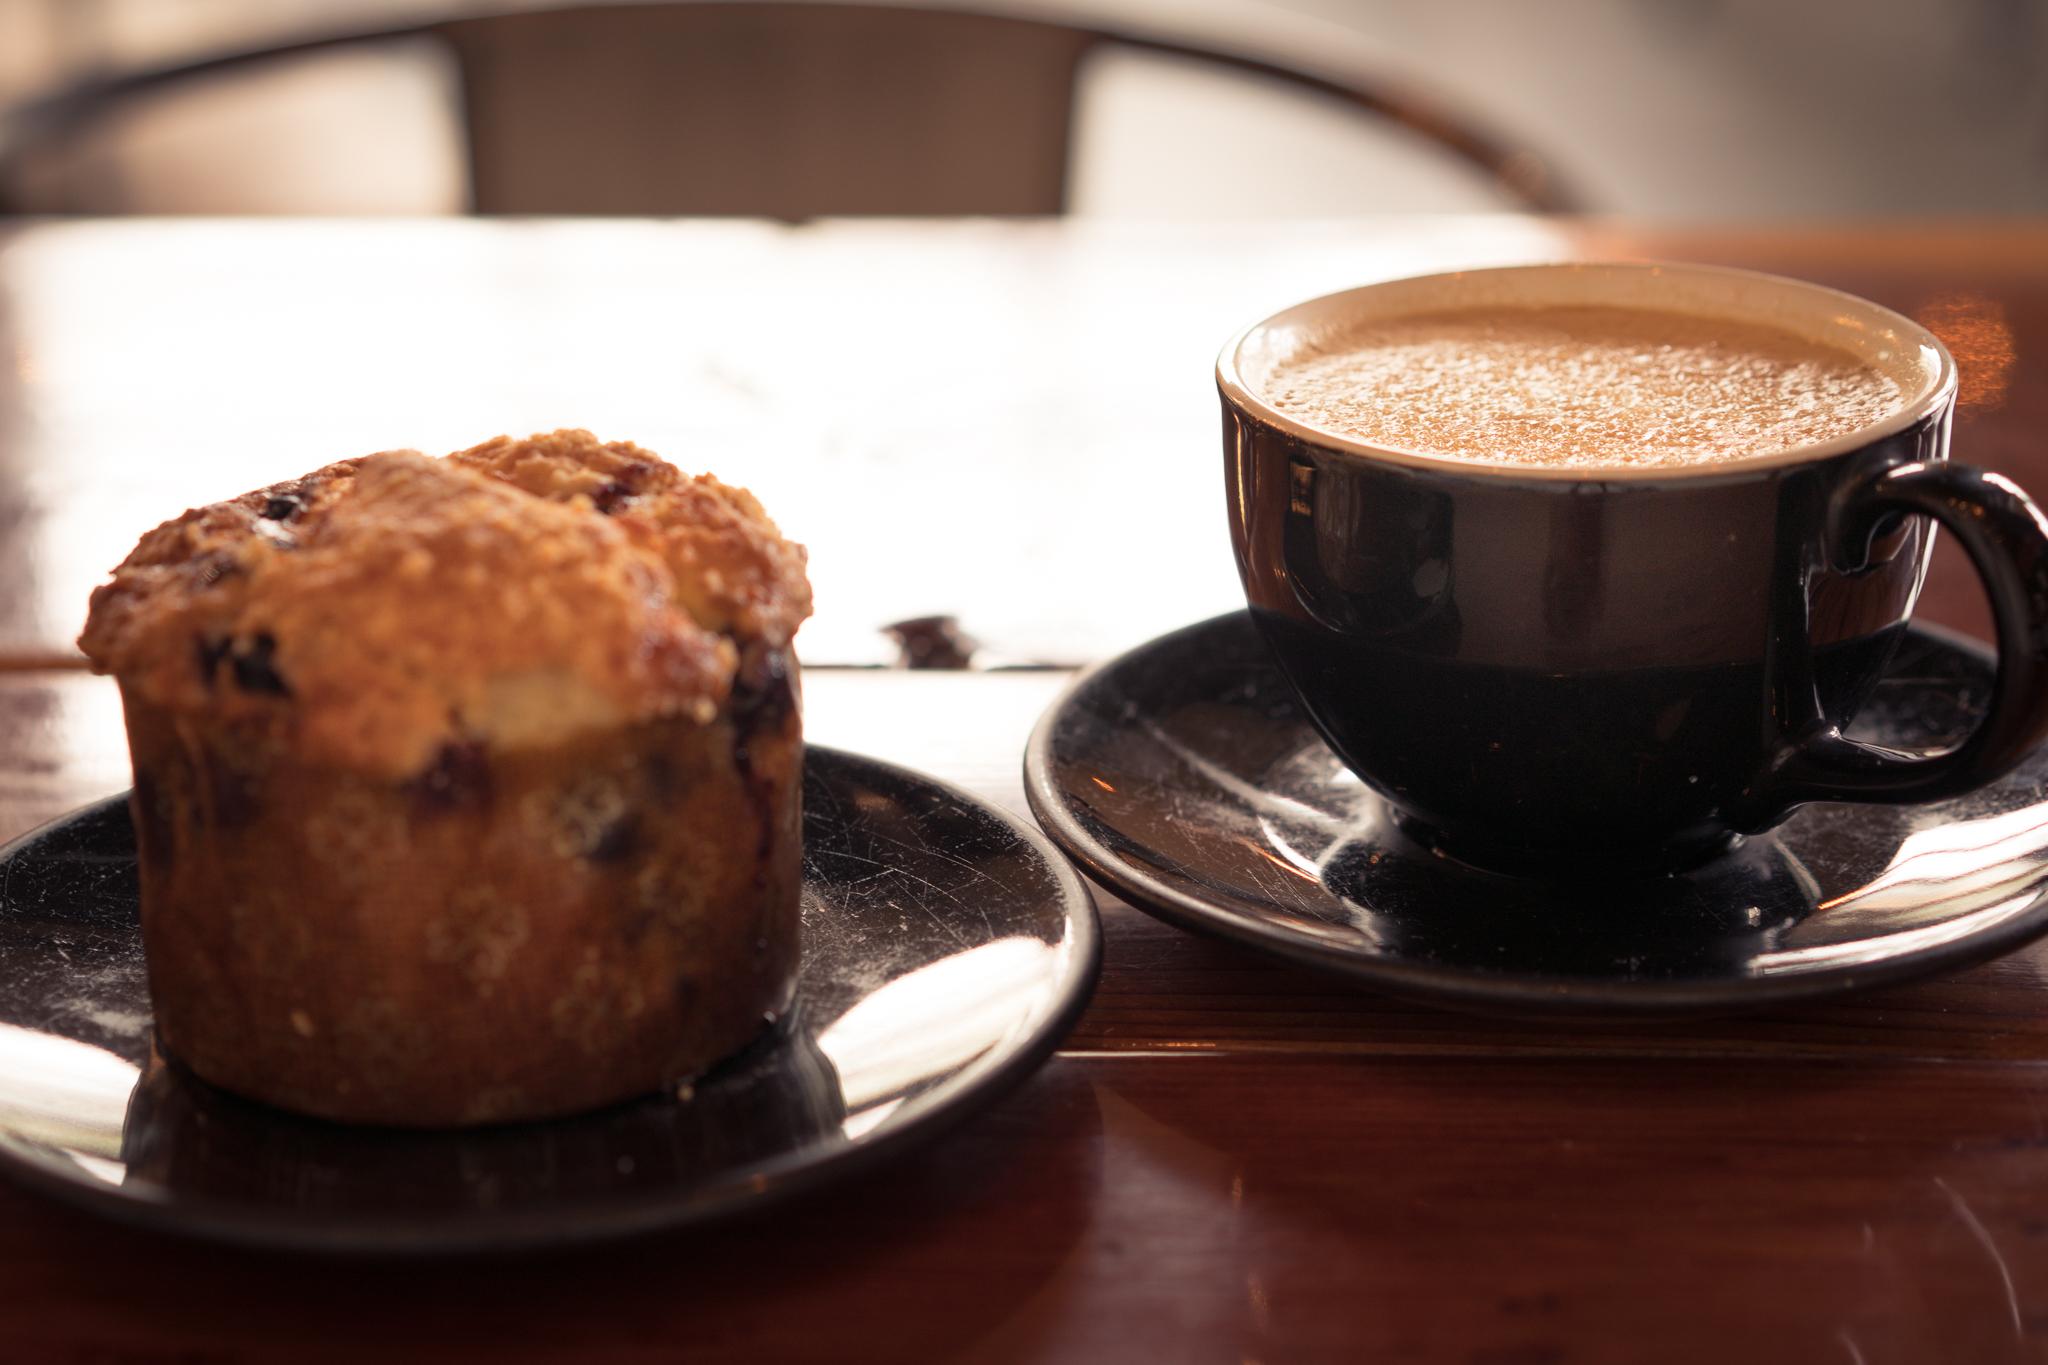 Breakfast at Taylor Lane Organic Coffee's flagship Coffee Bar at the Barlow.